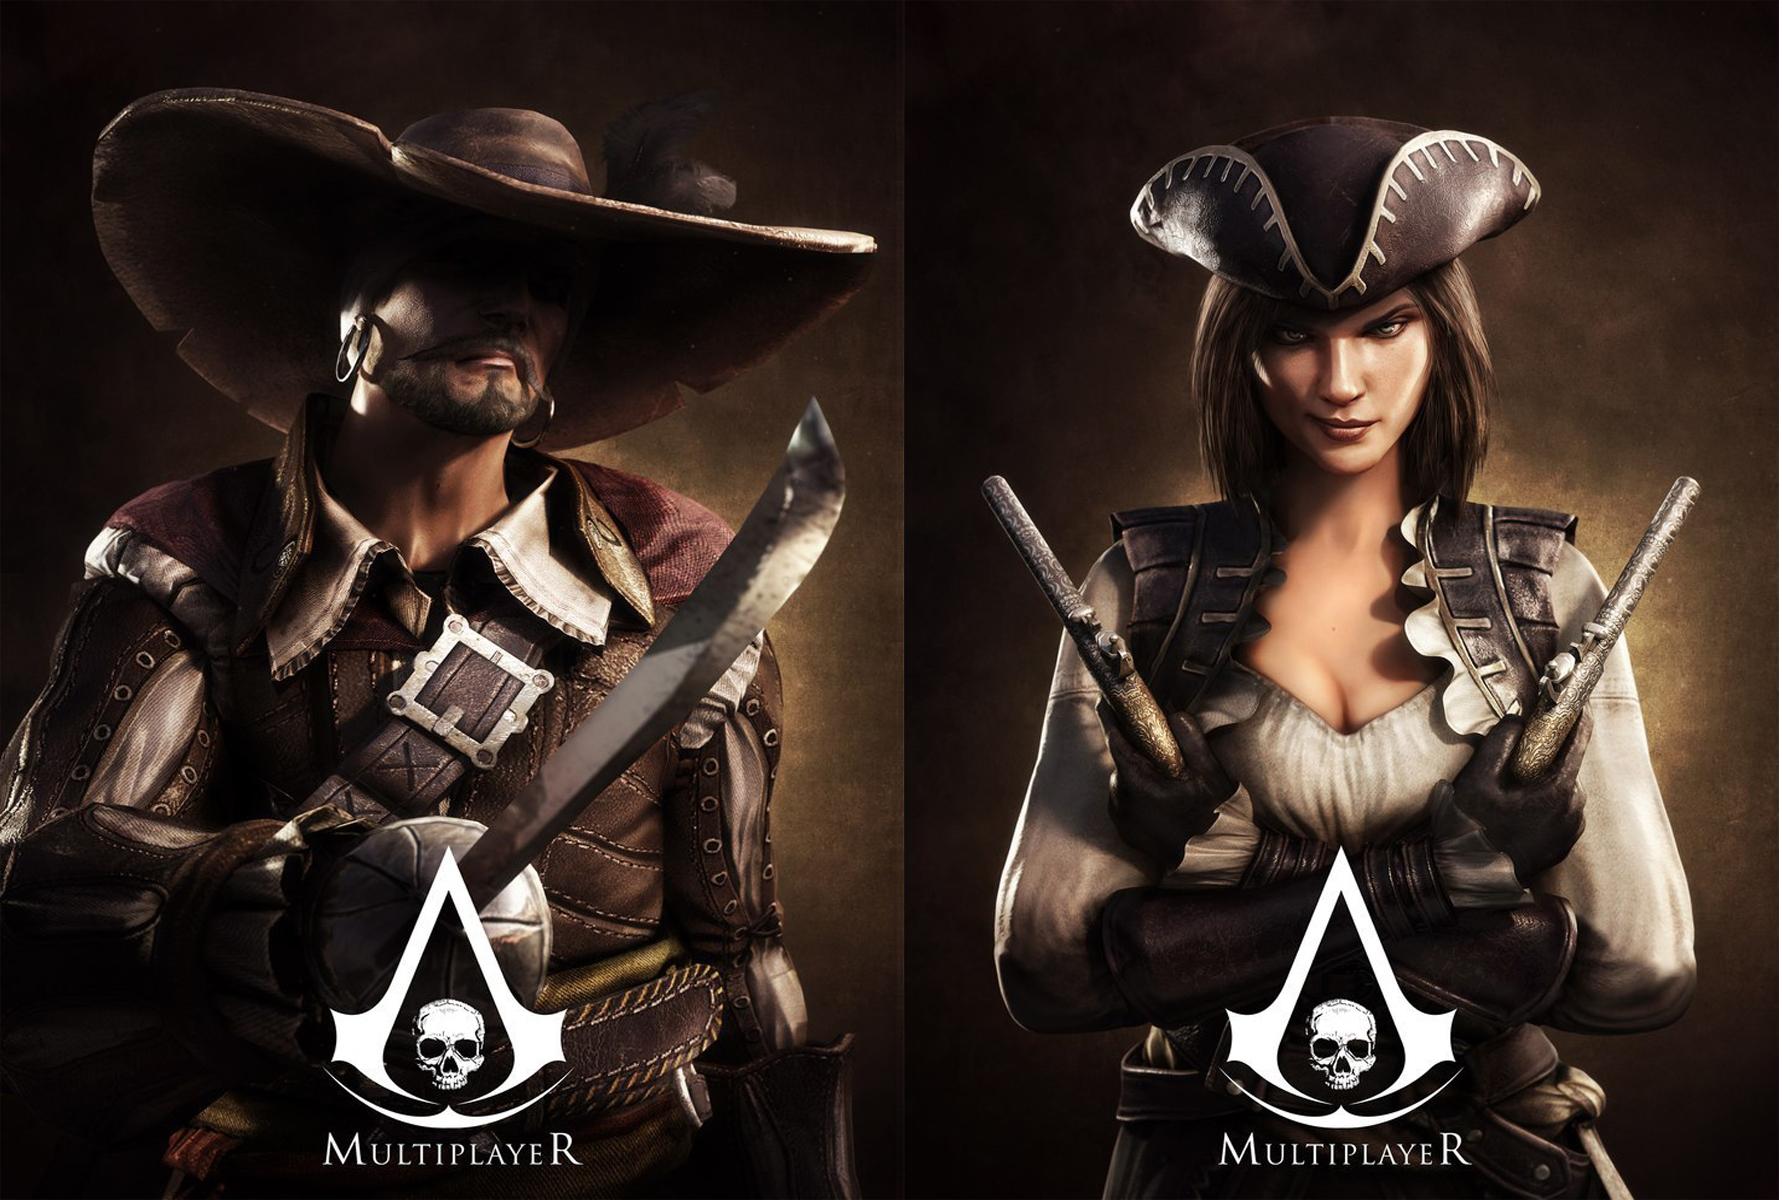 Assassins Creed 4 Multiplayer Femlae wallpaper 1782x1200